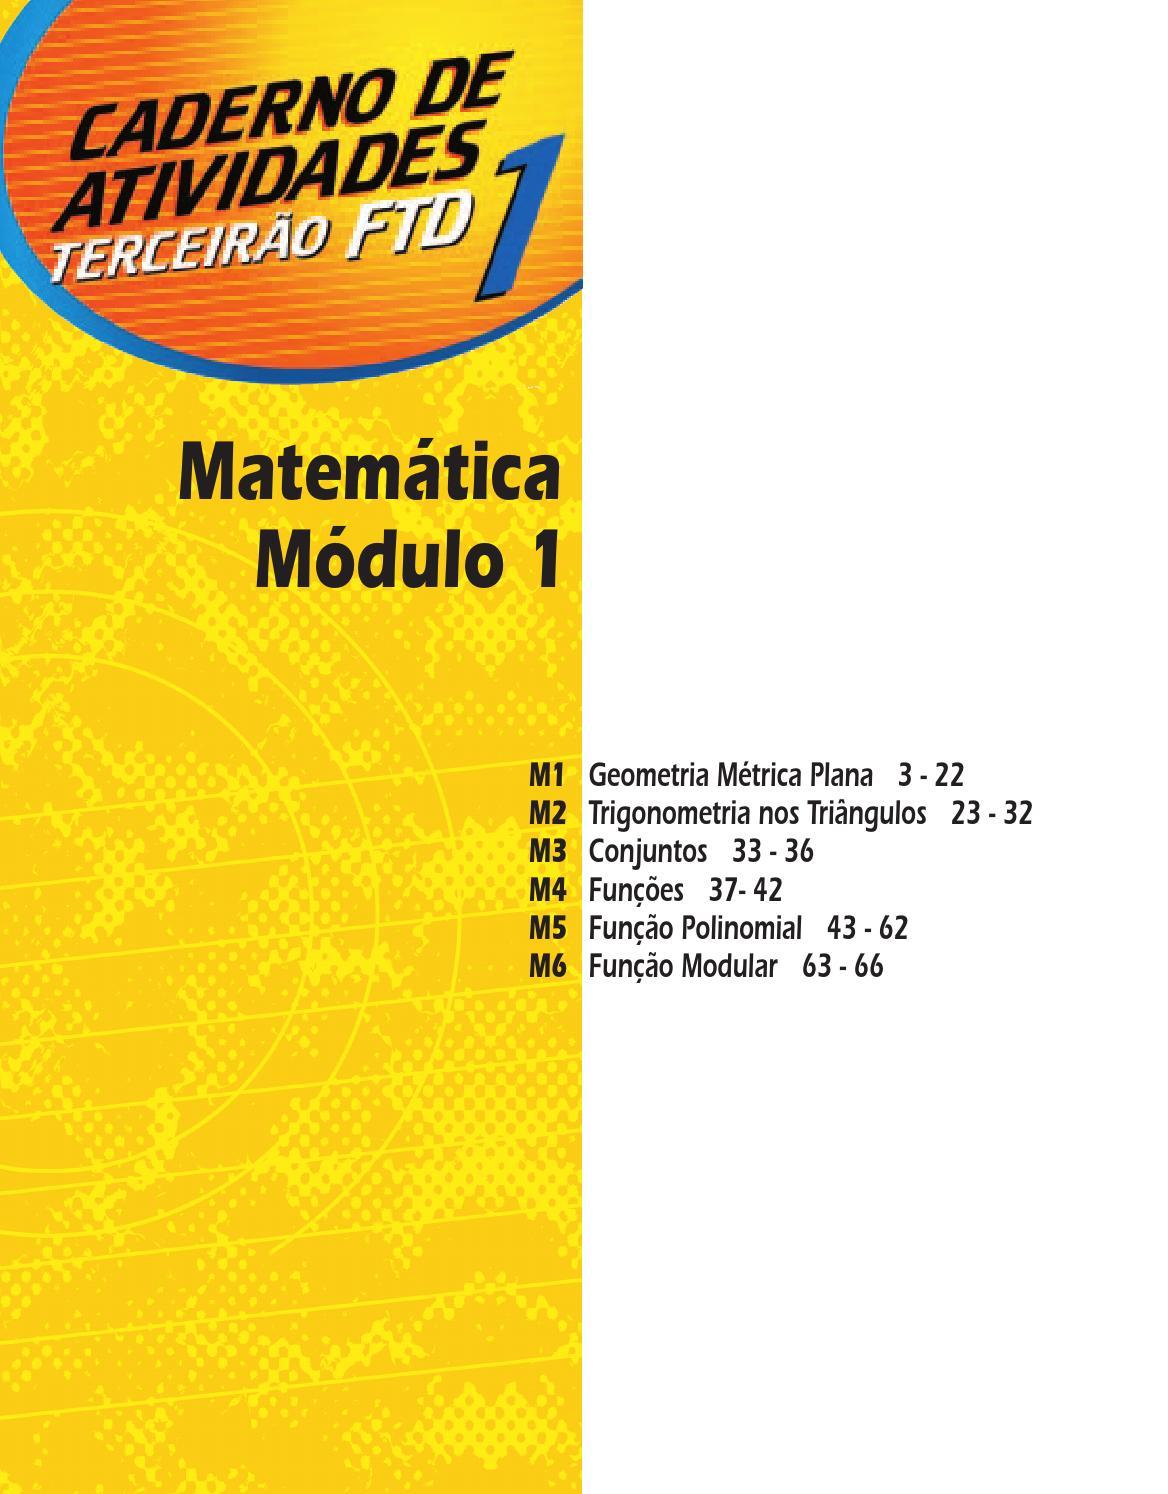 1 Matemática Exercícios Resolvidos 01 M2 Geometria Métrica Plana By